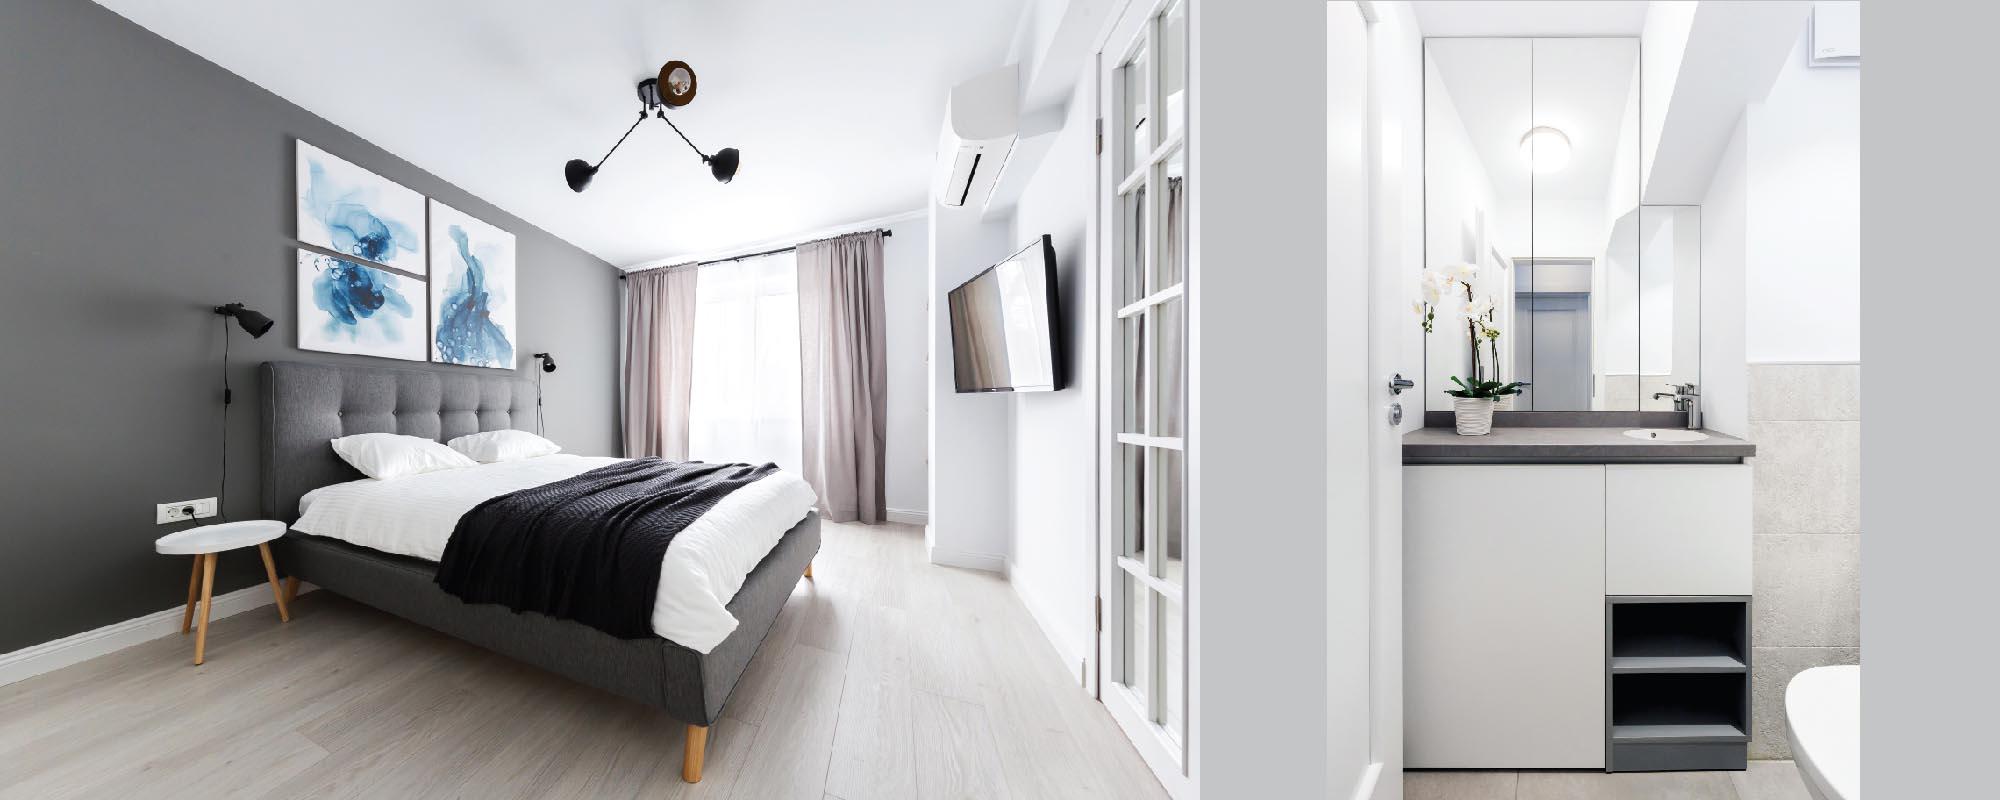 Interioare-Urbane-arhitect-design-interior-amenajari-interioare-Slider-1-1